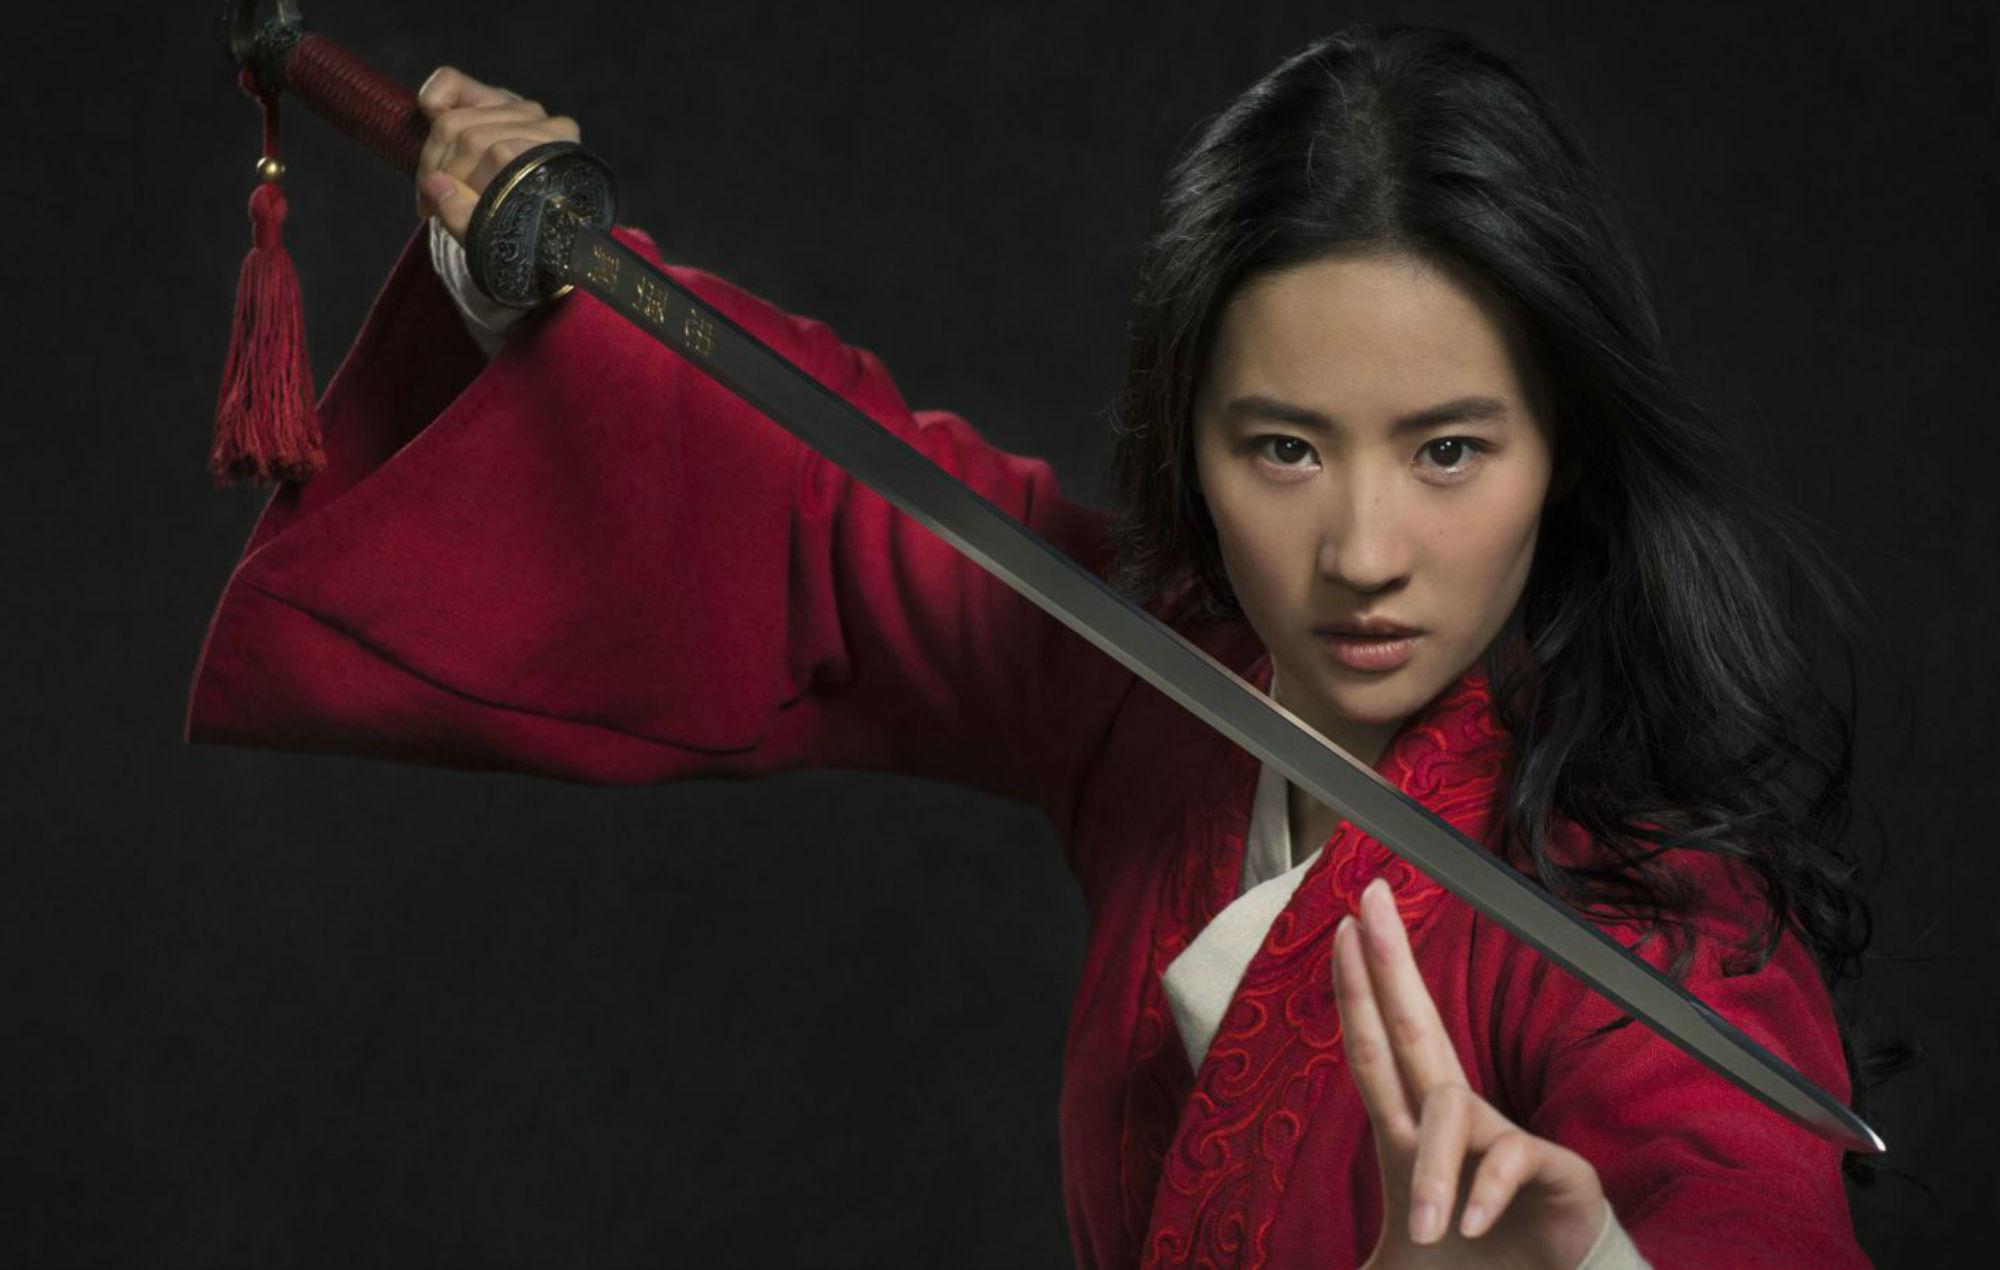 Disney's 'Mulan' to skip cinemas, will premiere on Disney+ instead | NME